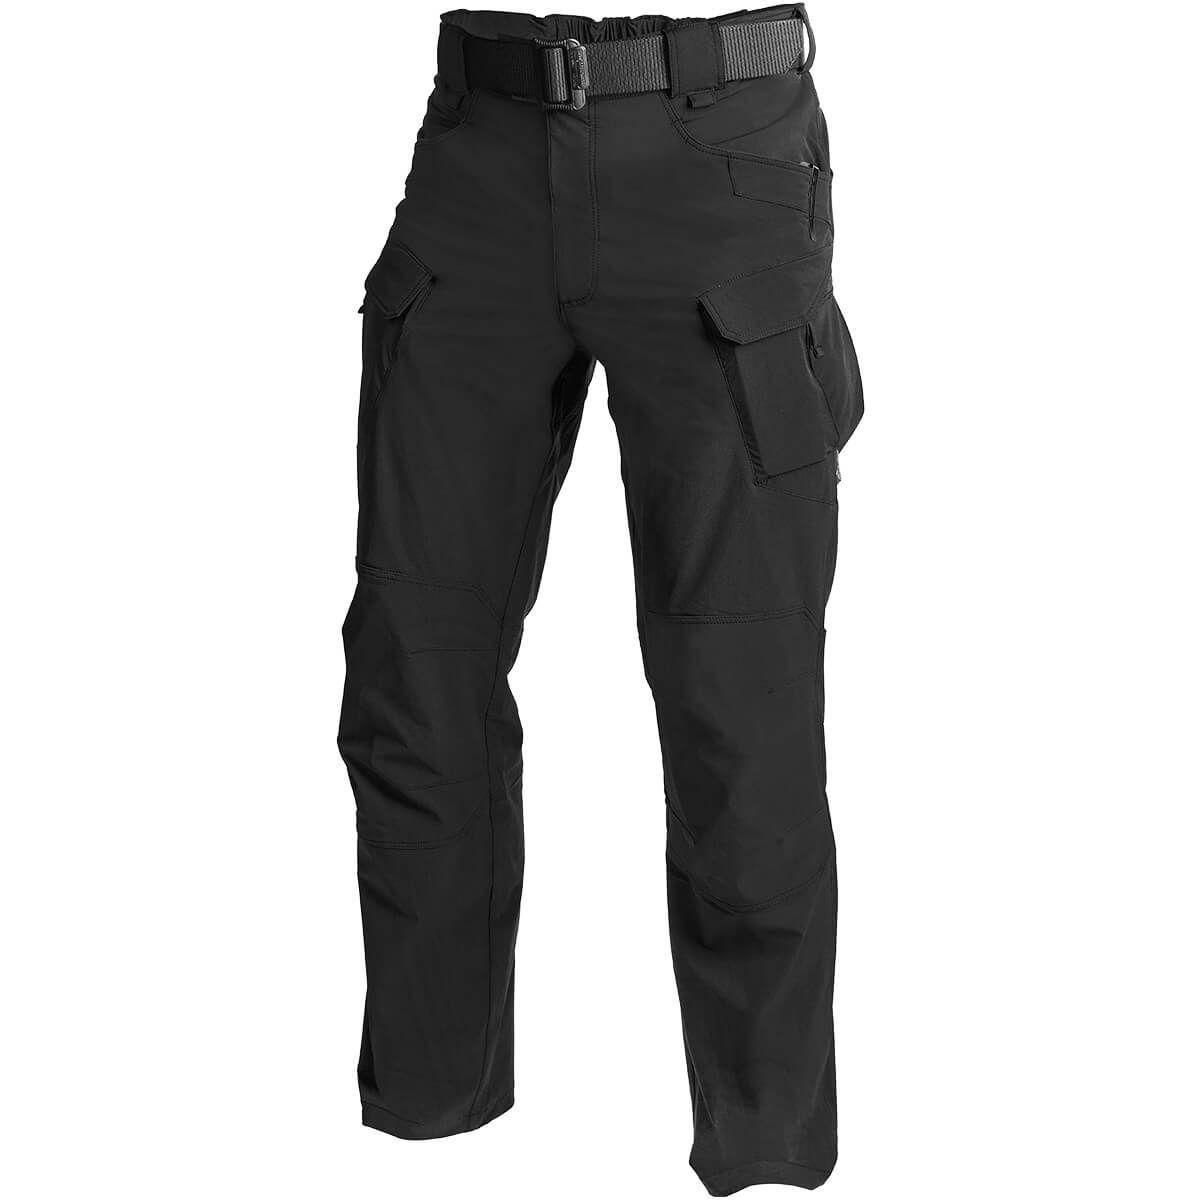 Штаны Helikon OTP Nylon Black Outdoor Tactical Pants (SP-OTP-NL-01) размер L/regular